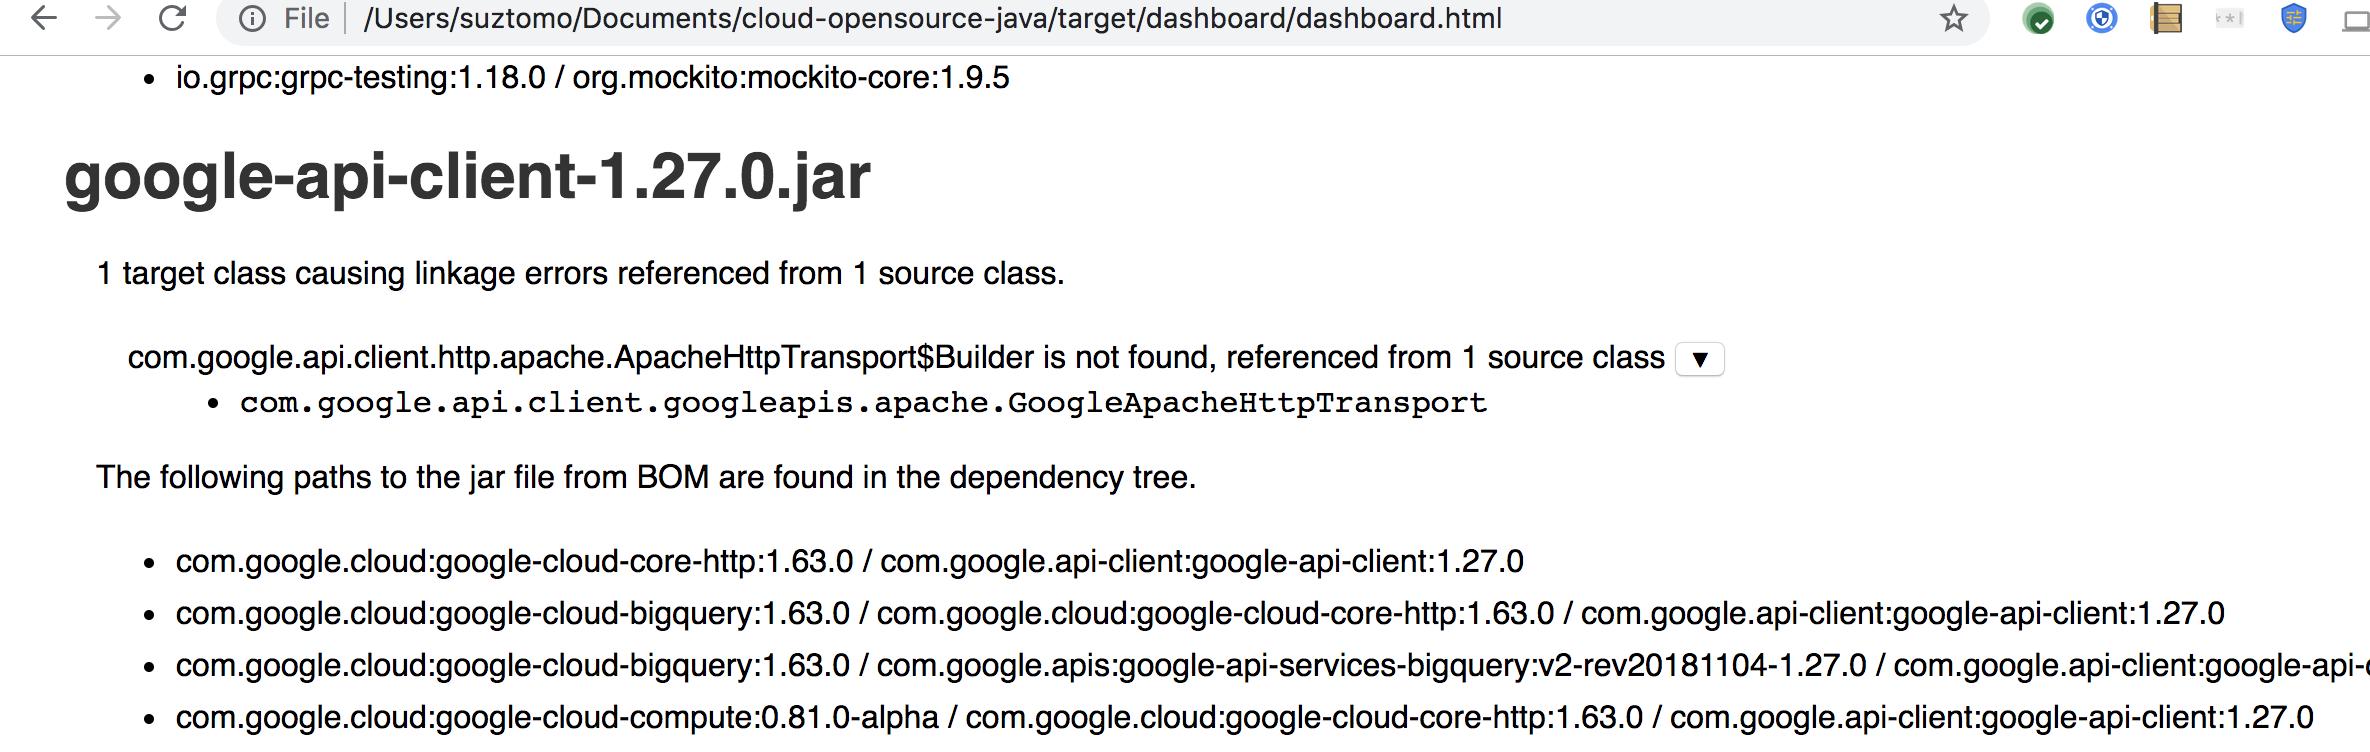 Investigate new linkage error in google-api-client-1 27 0